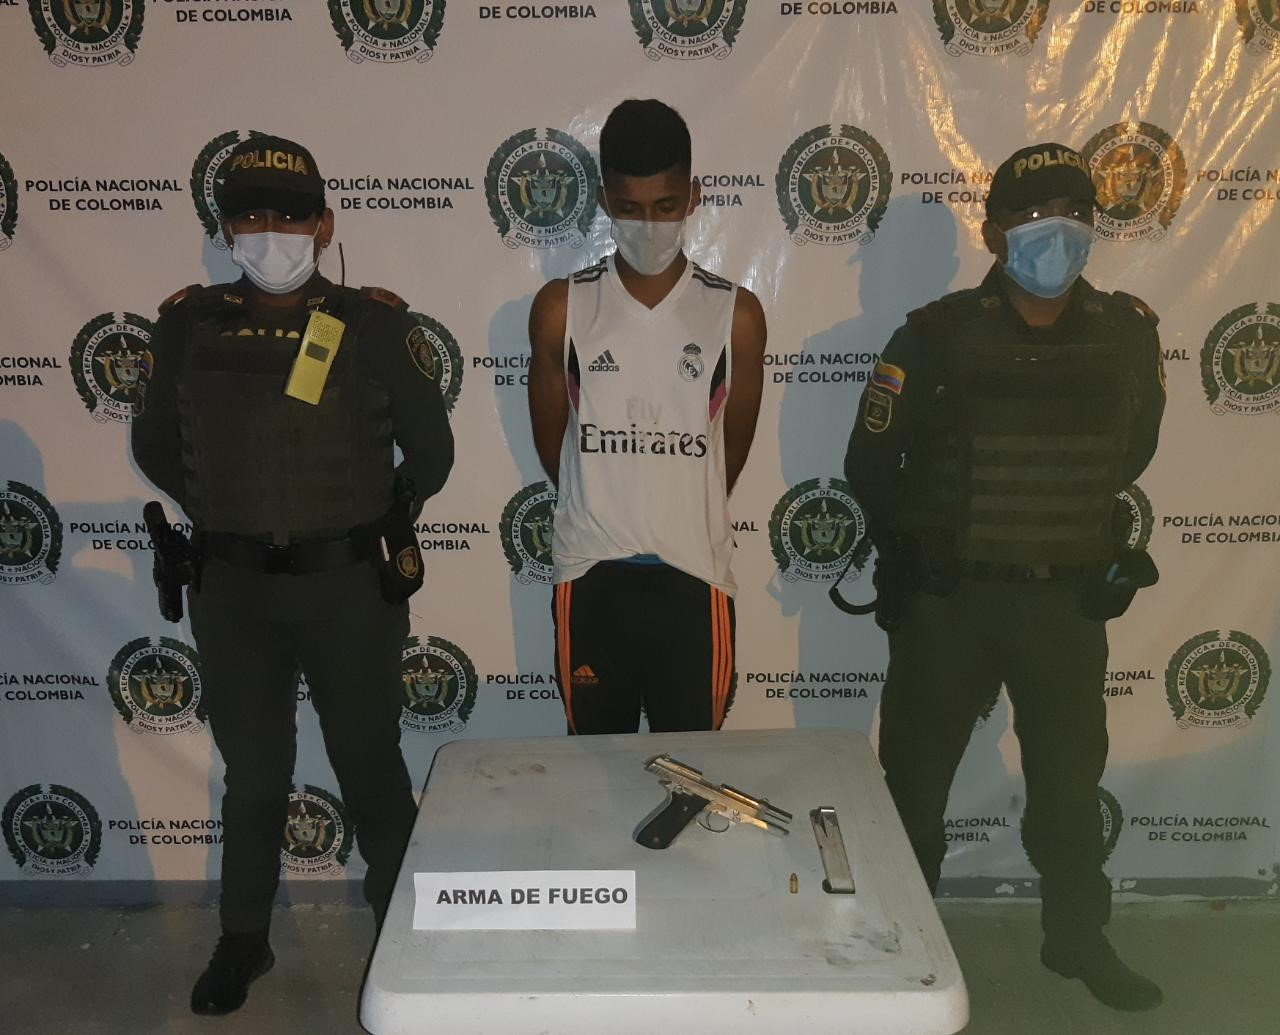 hoyennoticia.com, Capturados dos sospechosos con un arma en Uribia